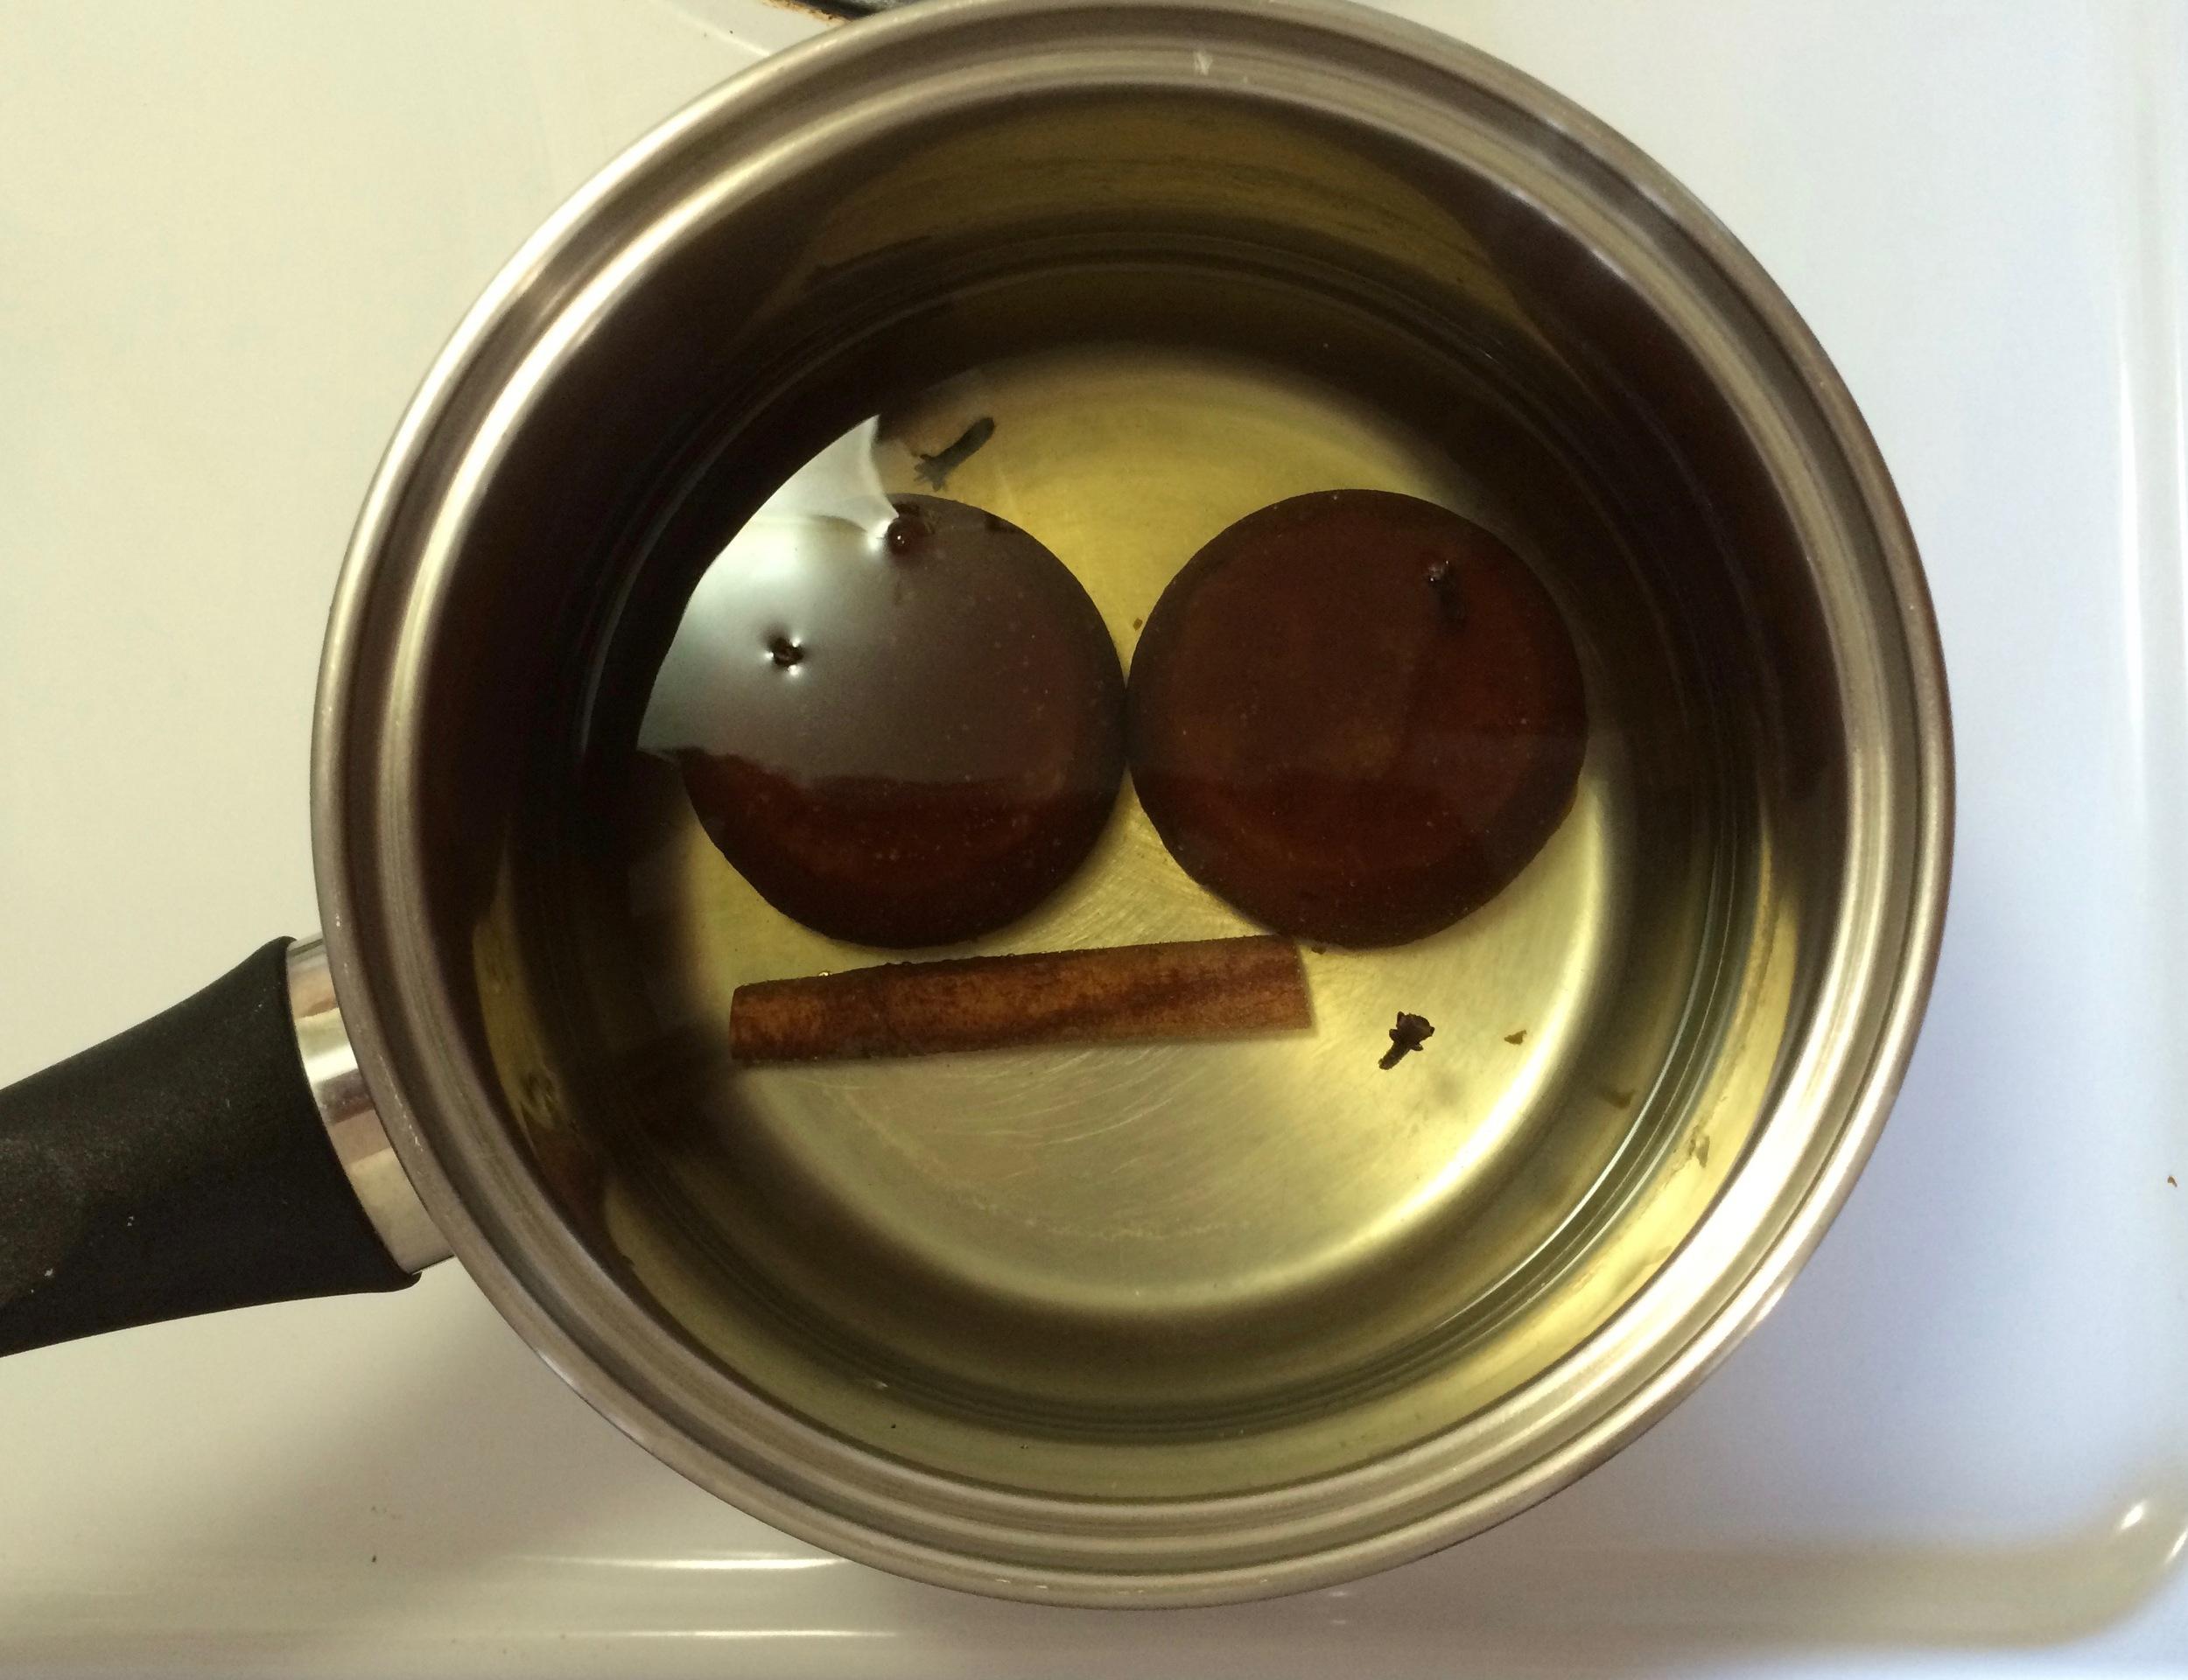 Preparing piloncillo syrup